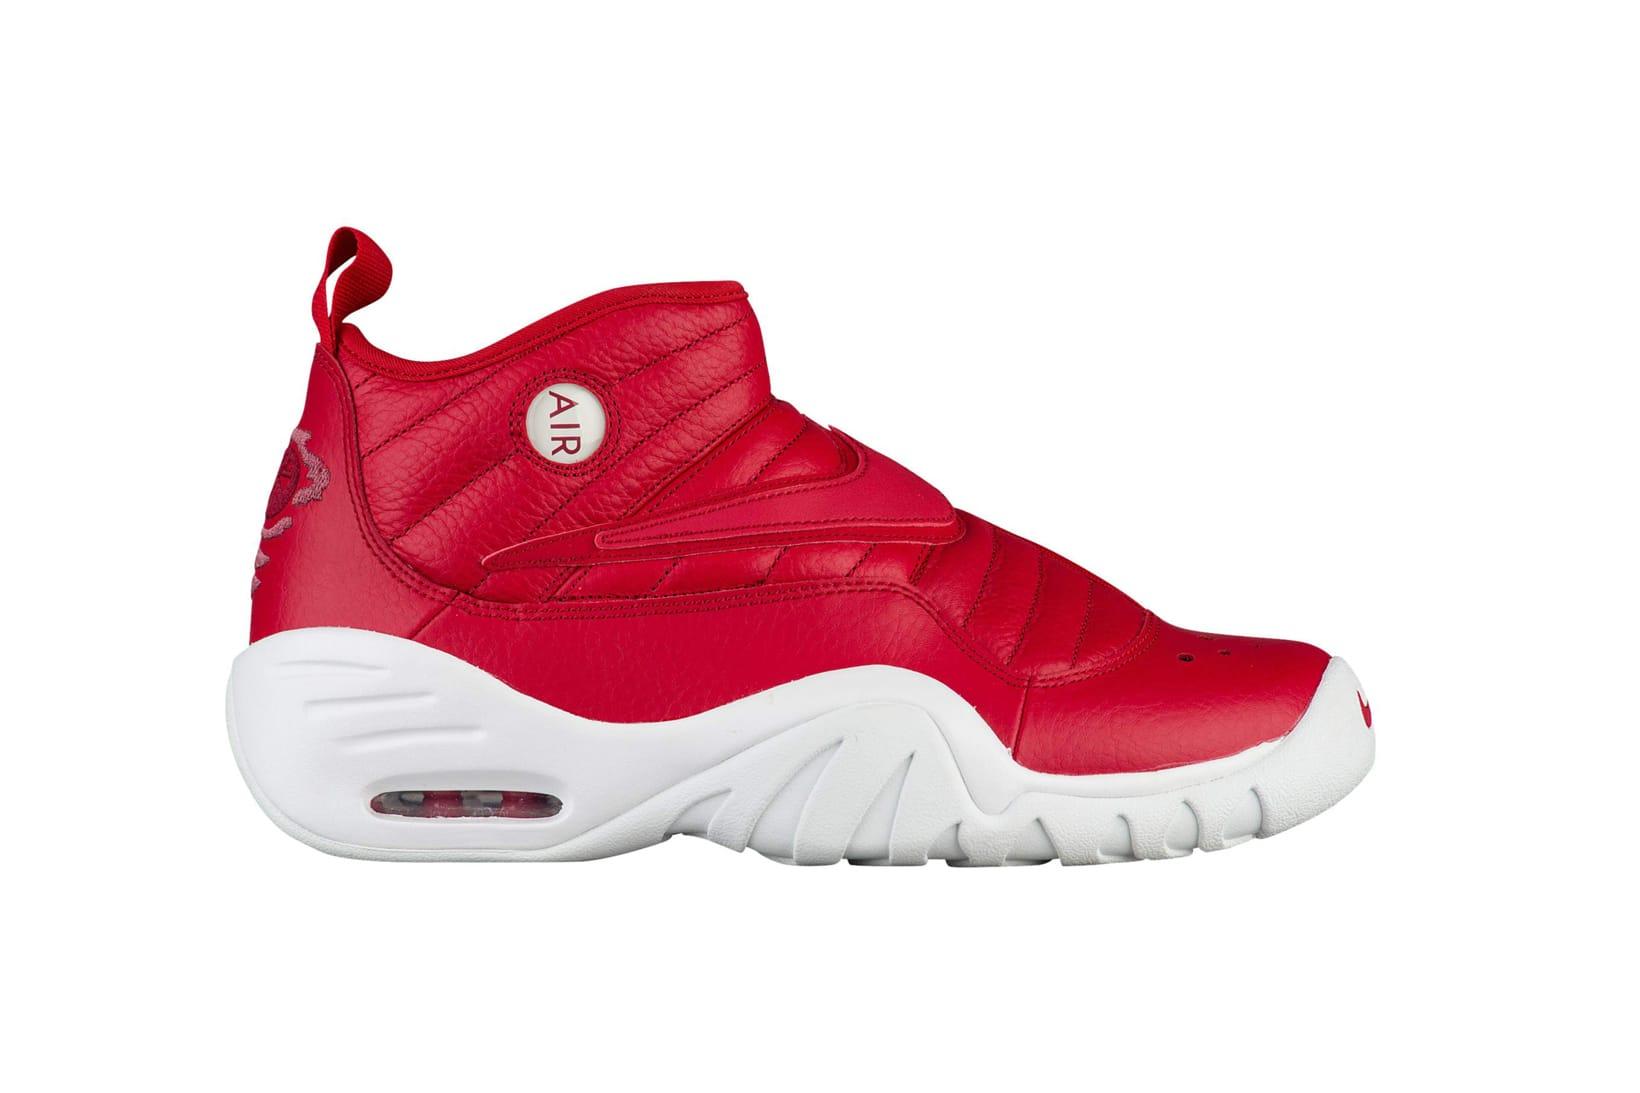 Nike Air Shake NDestrukt All White and